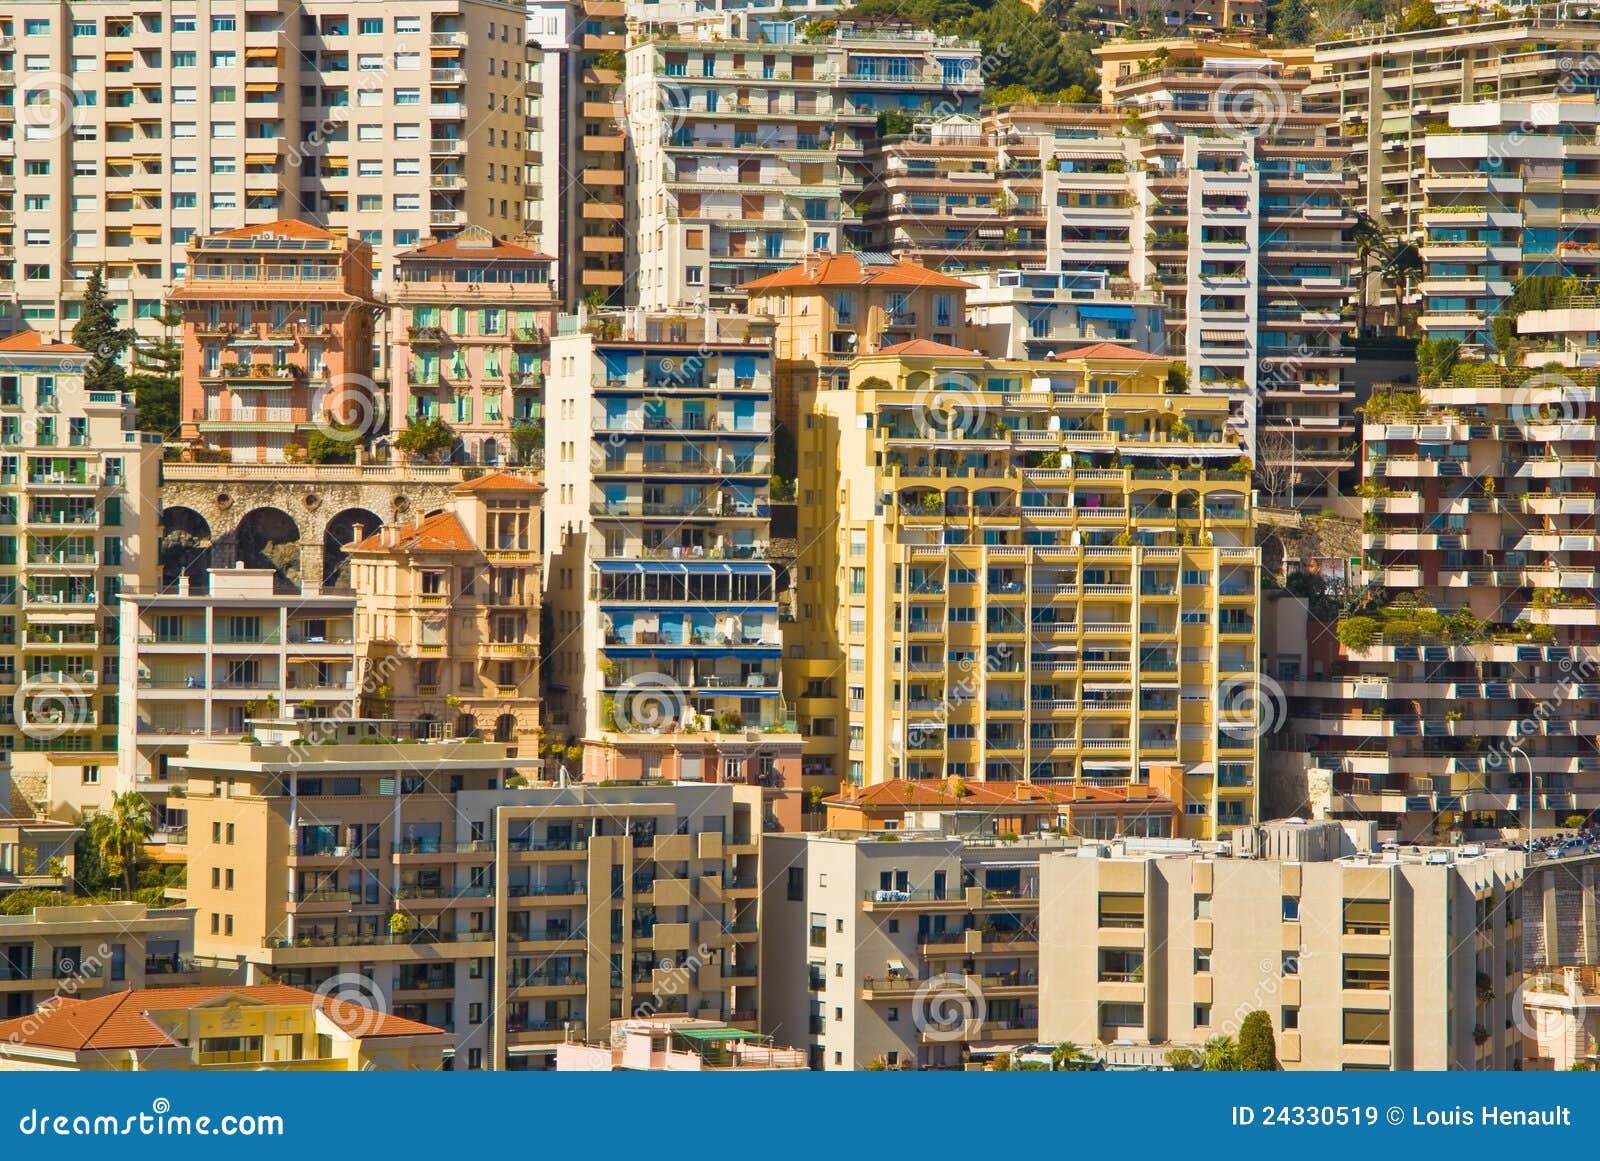 Monaco Apartment Buildings Stock Image Image Of Buildings